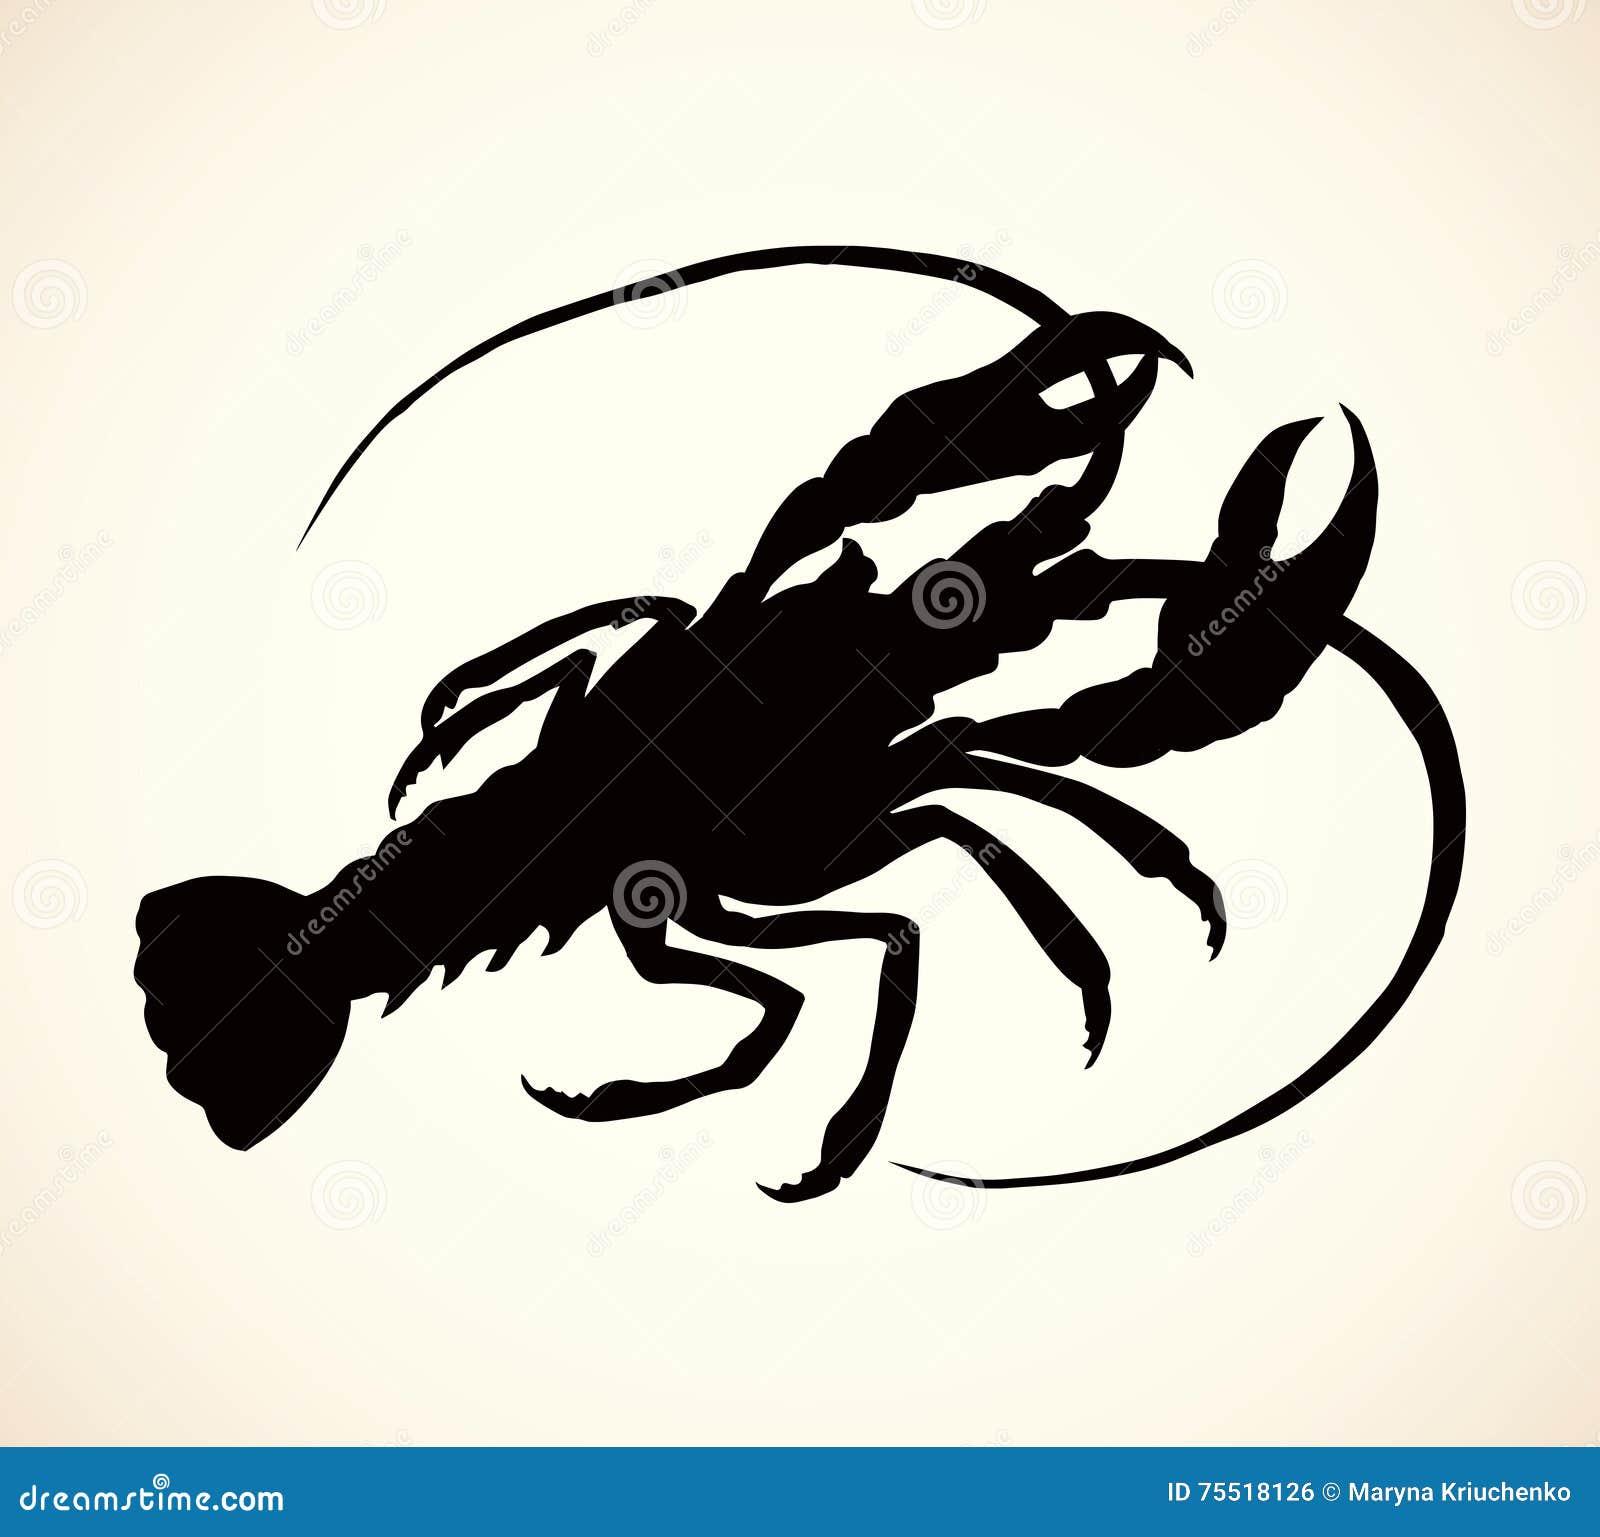 Crayfish. Vector Drawing Stock Vector. Illustration Of